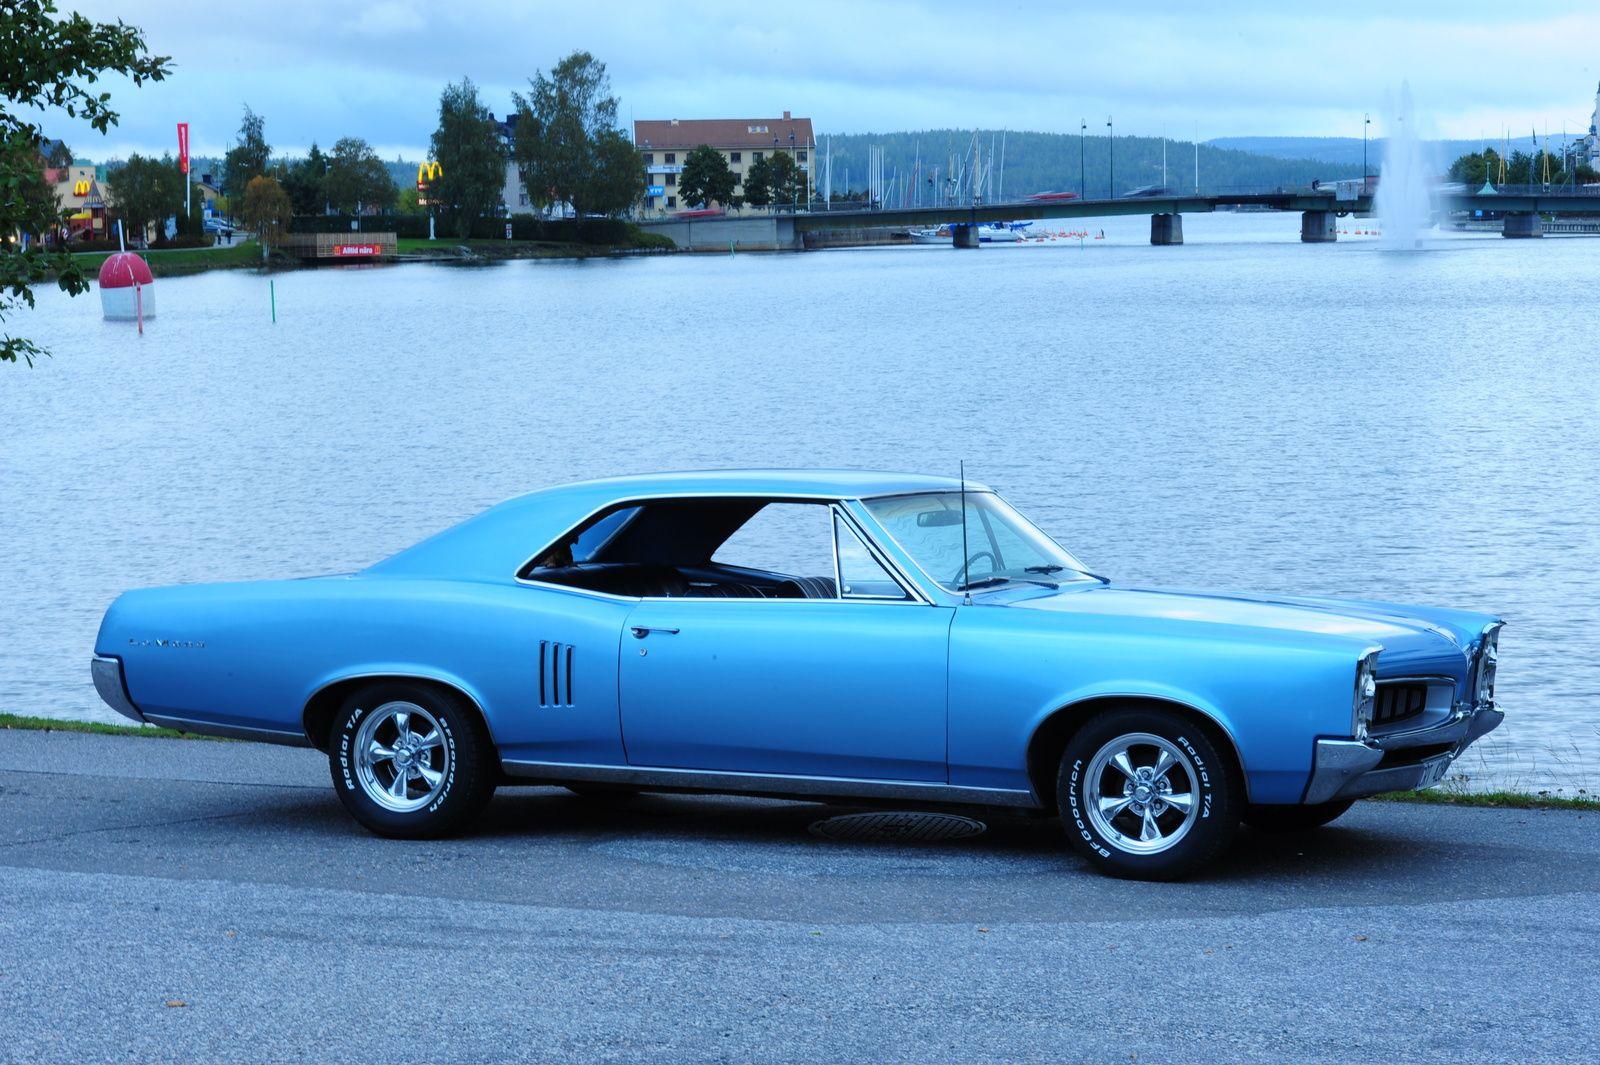 1967 Pontiac Lemans | Cars & Motorcycles | Pinterest | Pontiac ...